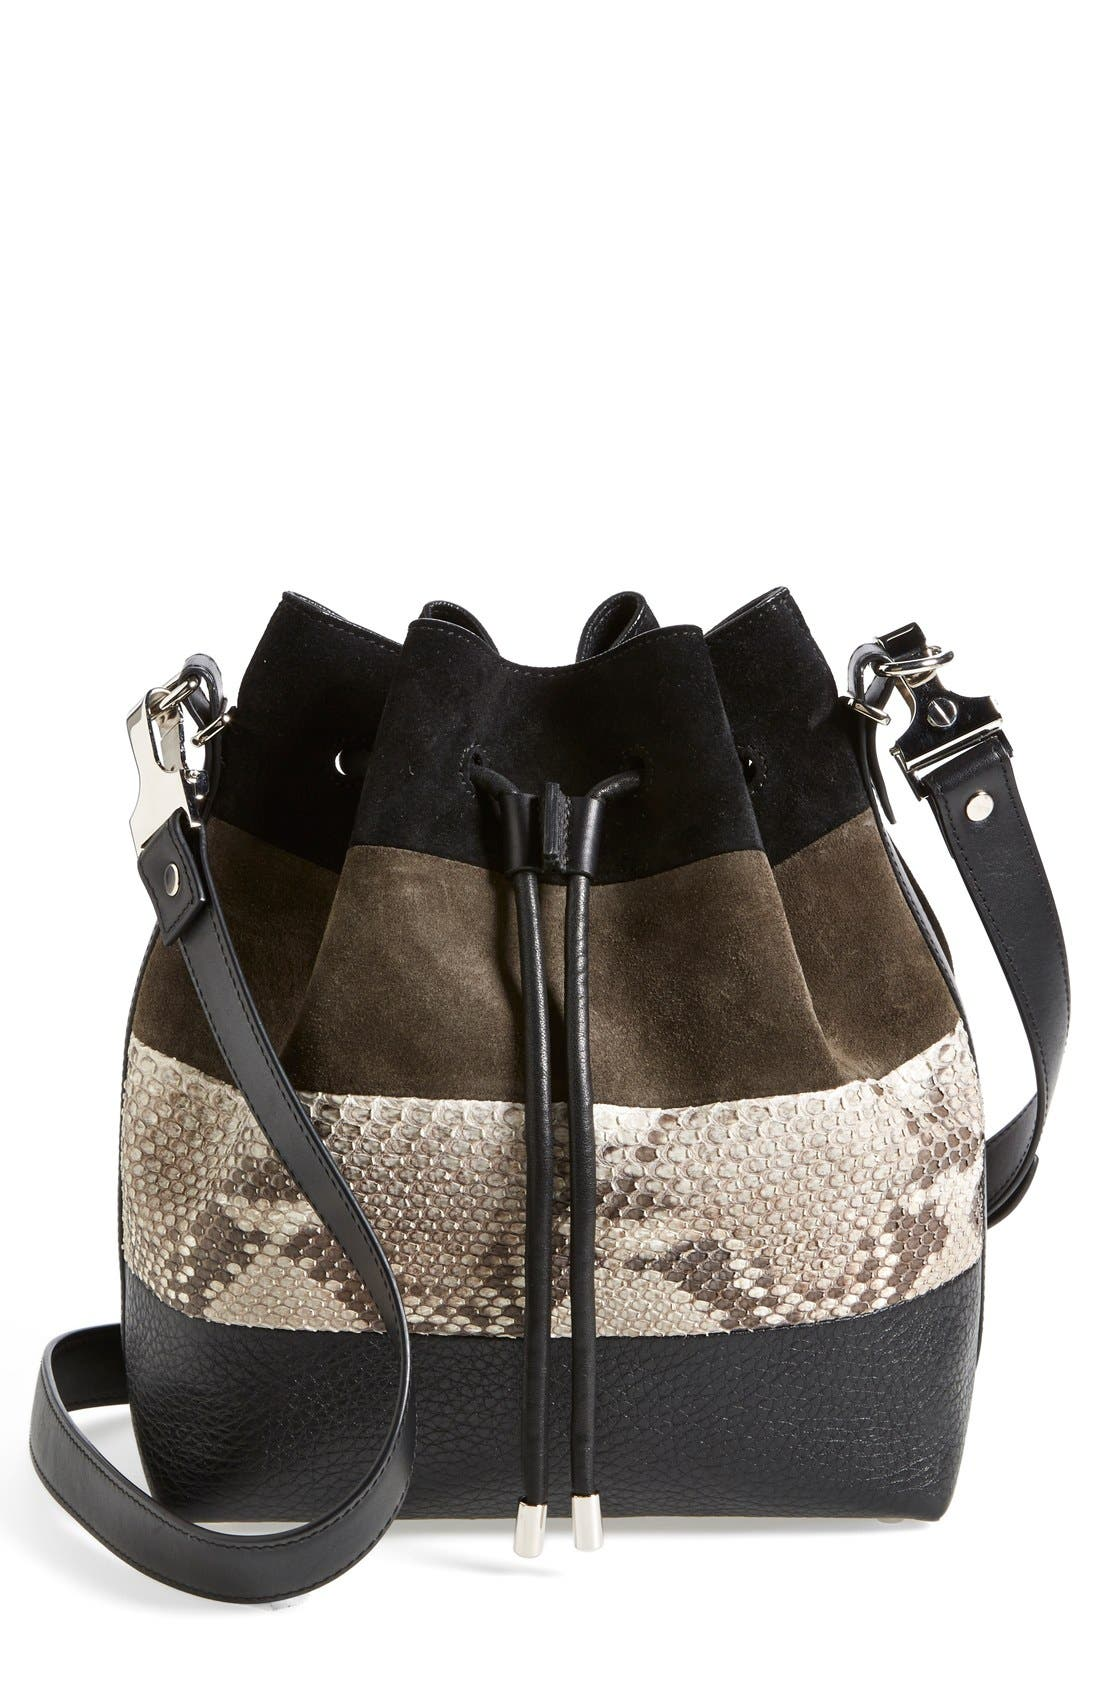 Main Image - Proenza Schouler 'Medium' Suede & Genuine Snakeskin Bucket Bag